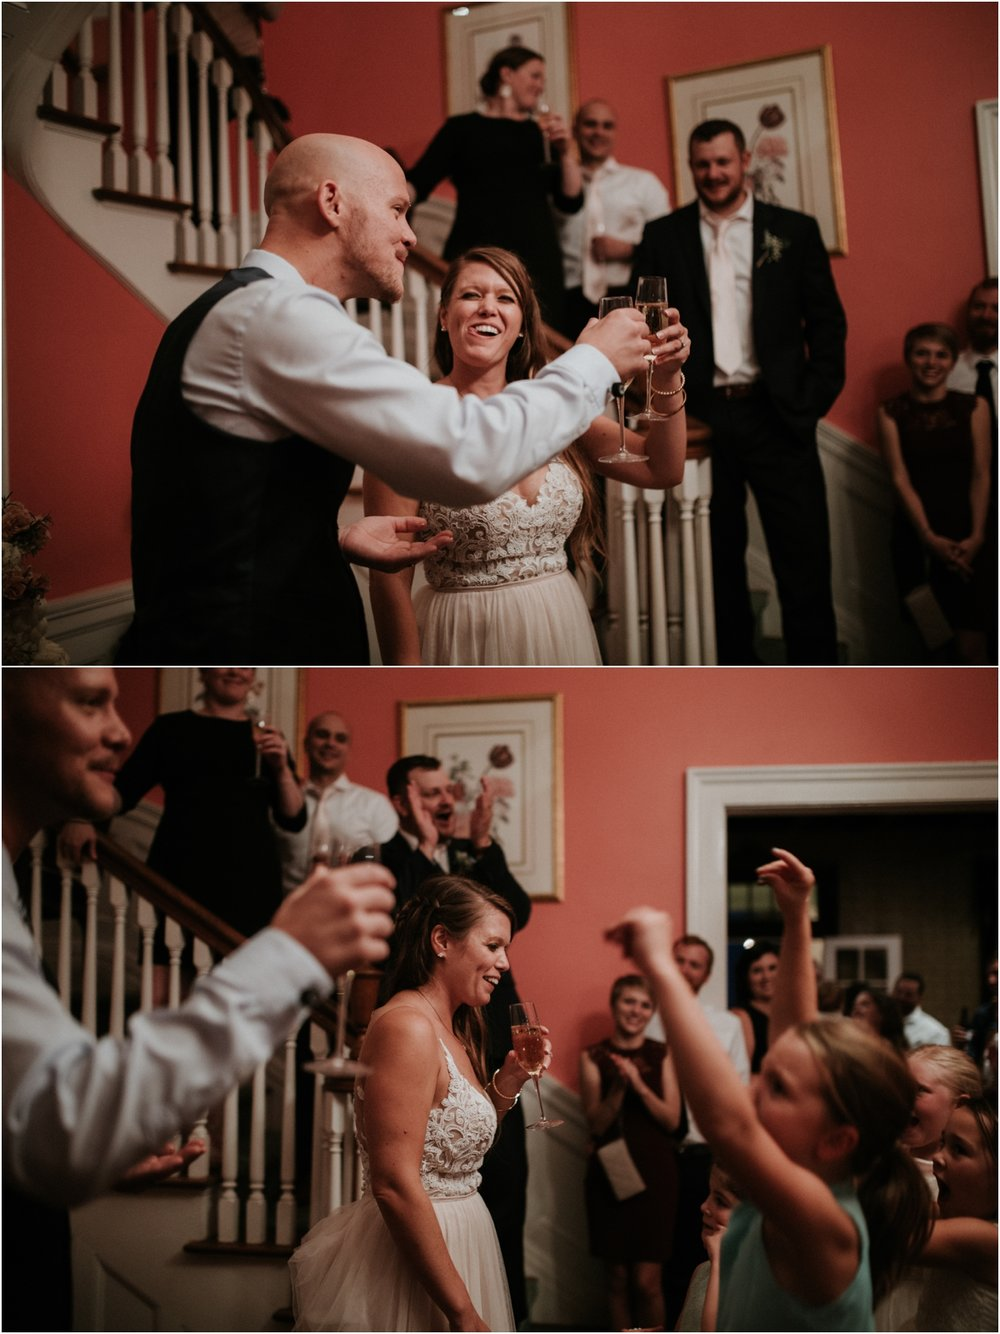 Stowe-manor-wedding-belmont-nc_0064.jpg